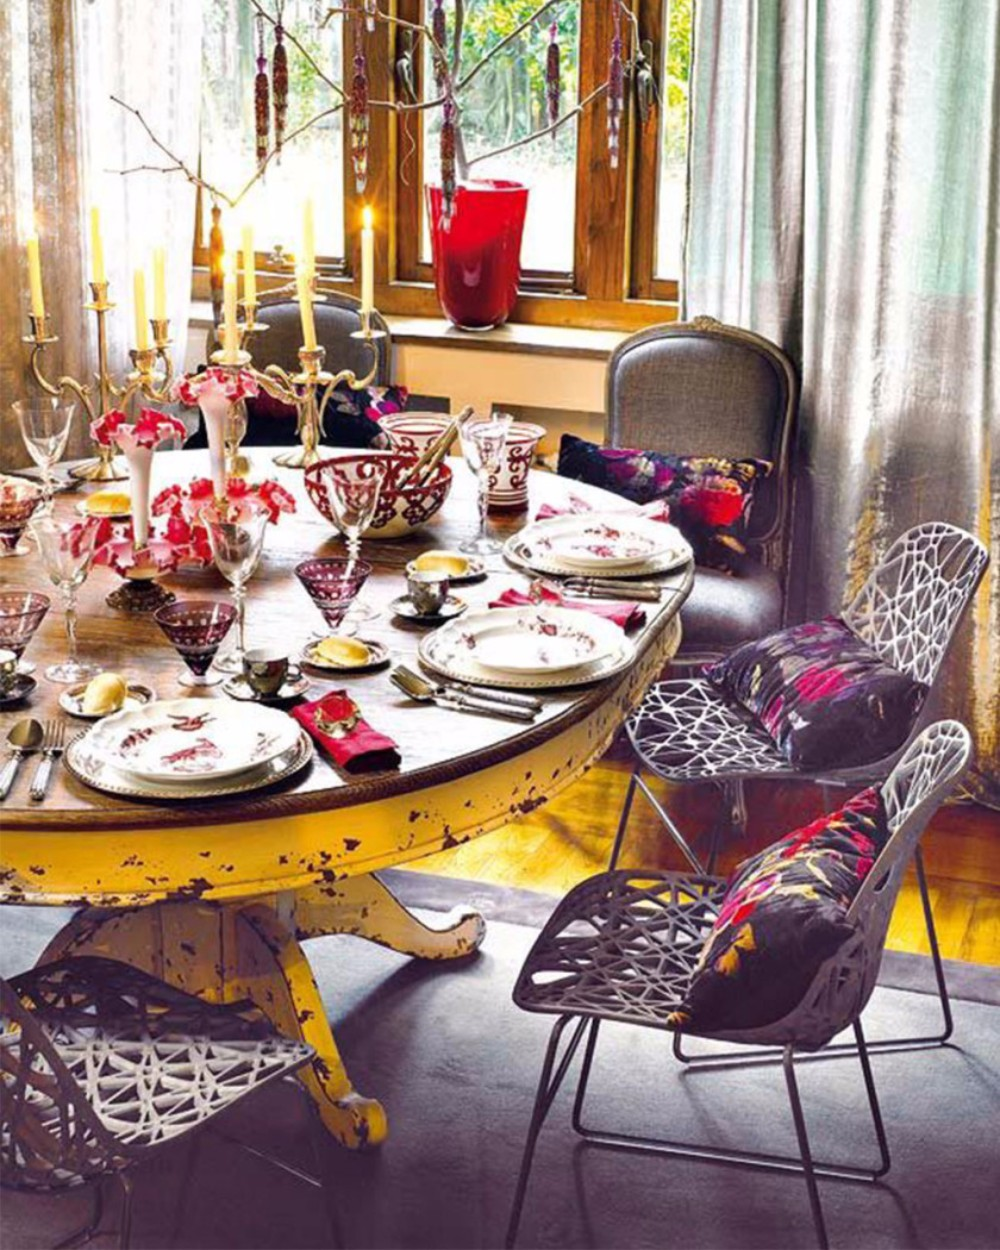 boho chic 25 Boho Chic Dining Room Designs That Will Inspire You 25 boho chic dining room designs that will inspire you 15